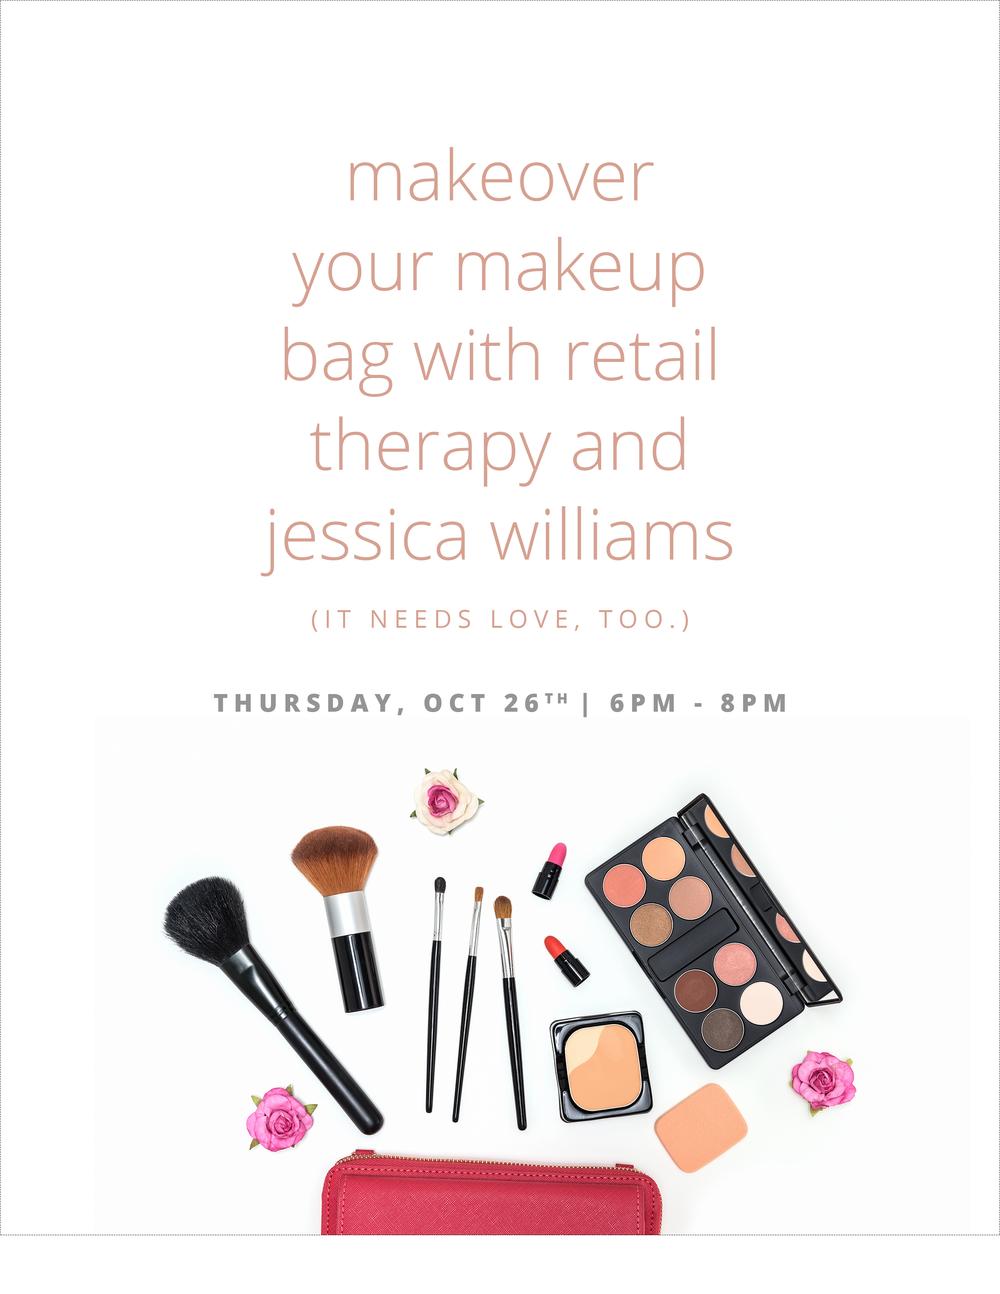 Event flyer for Instagram and Facebook